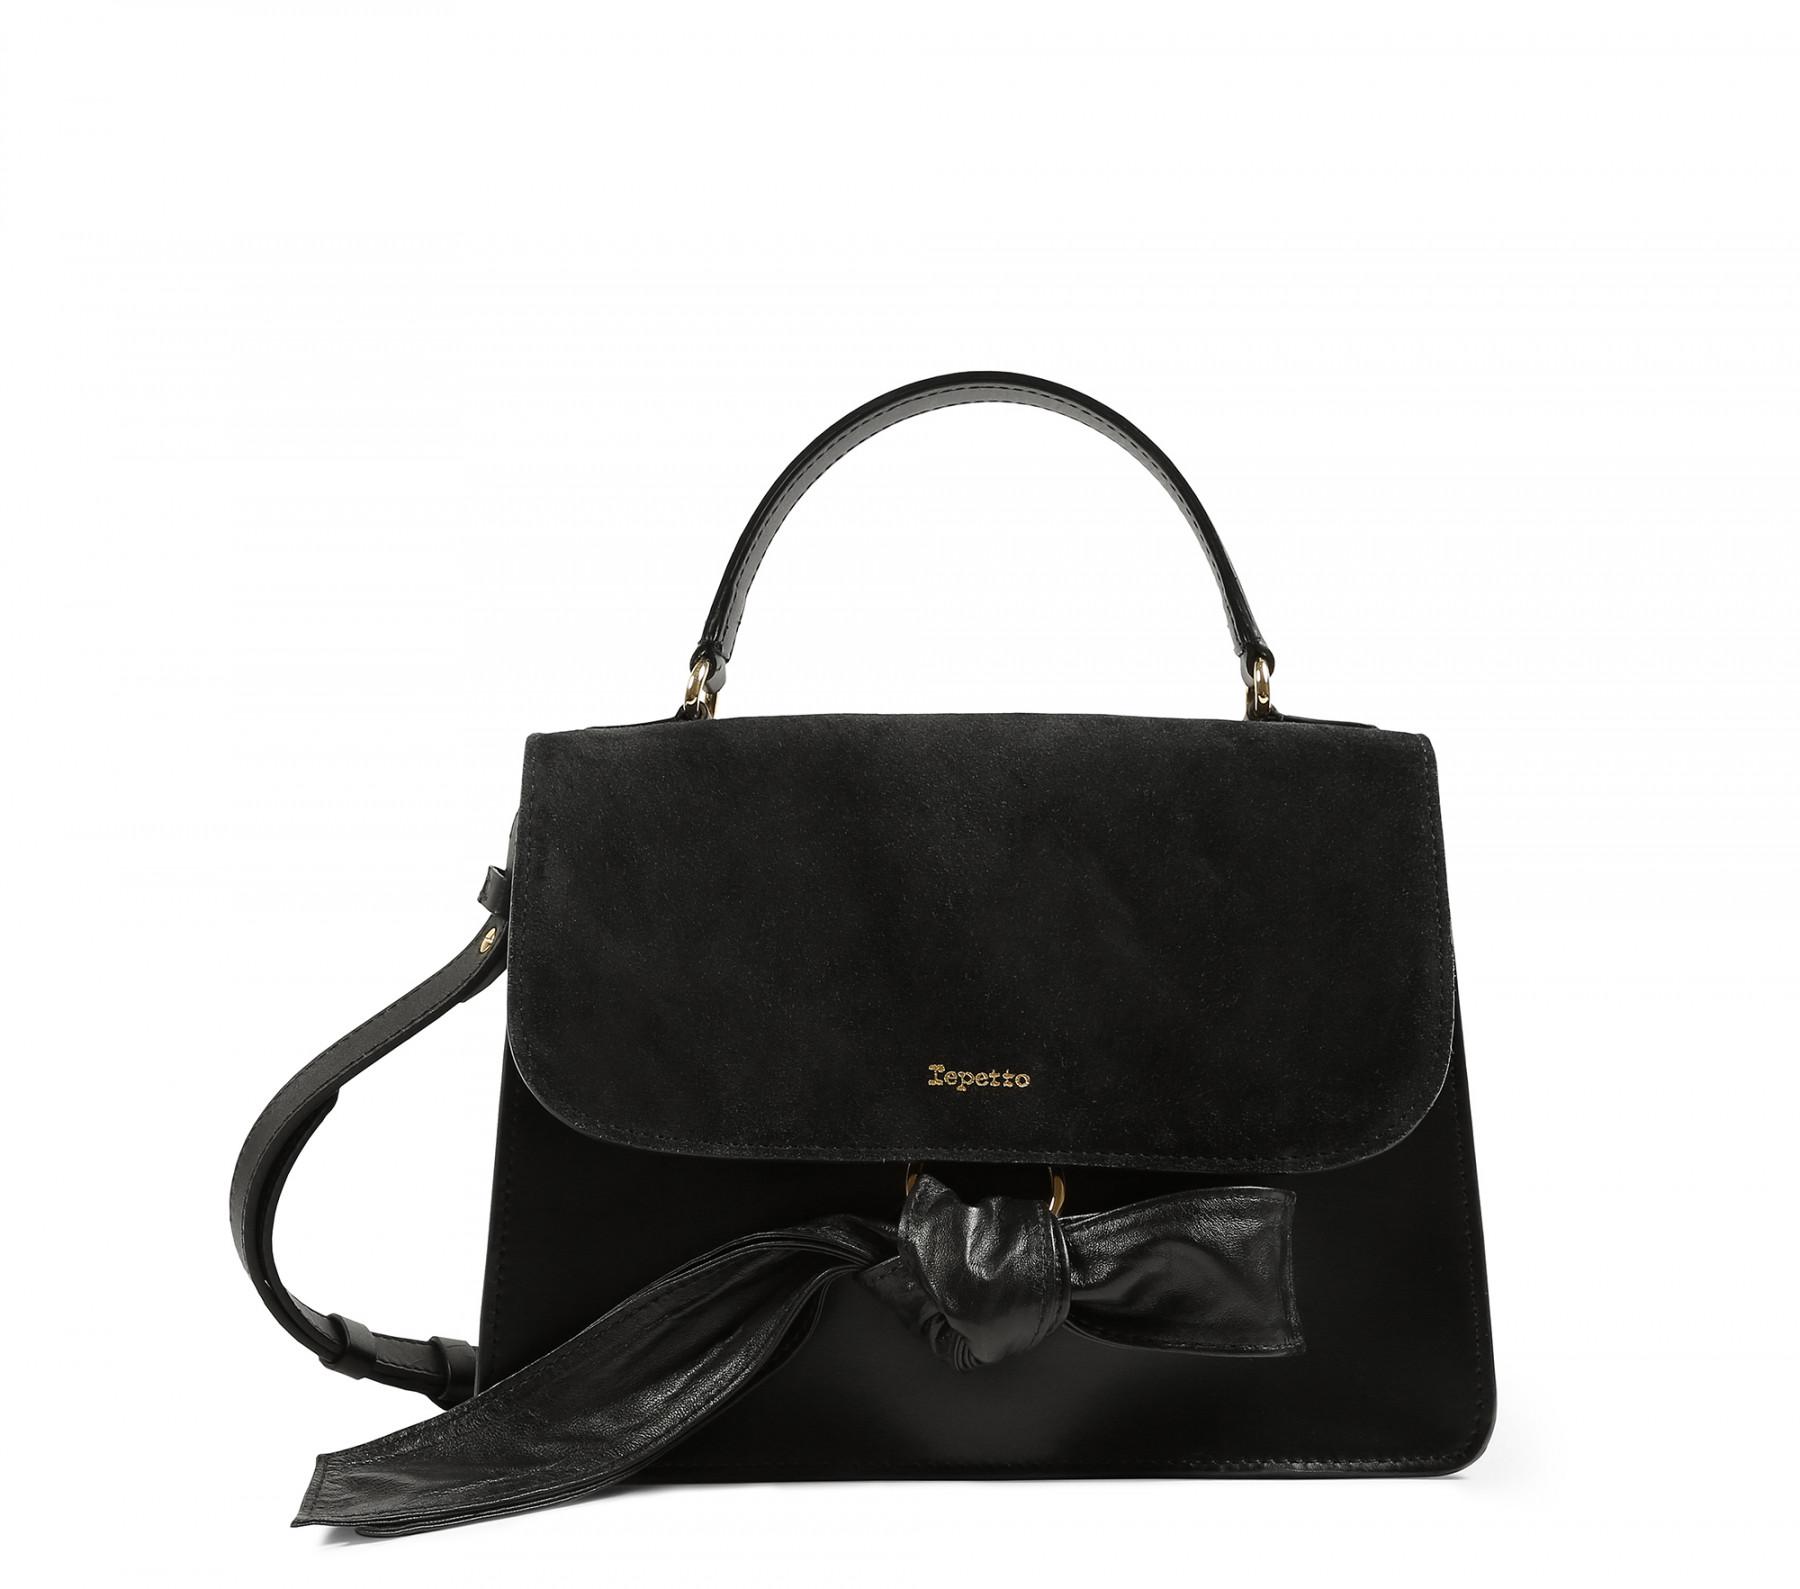 Double Jeu bag Large size